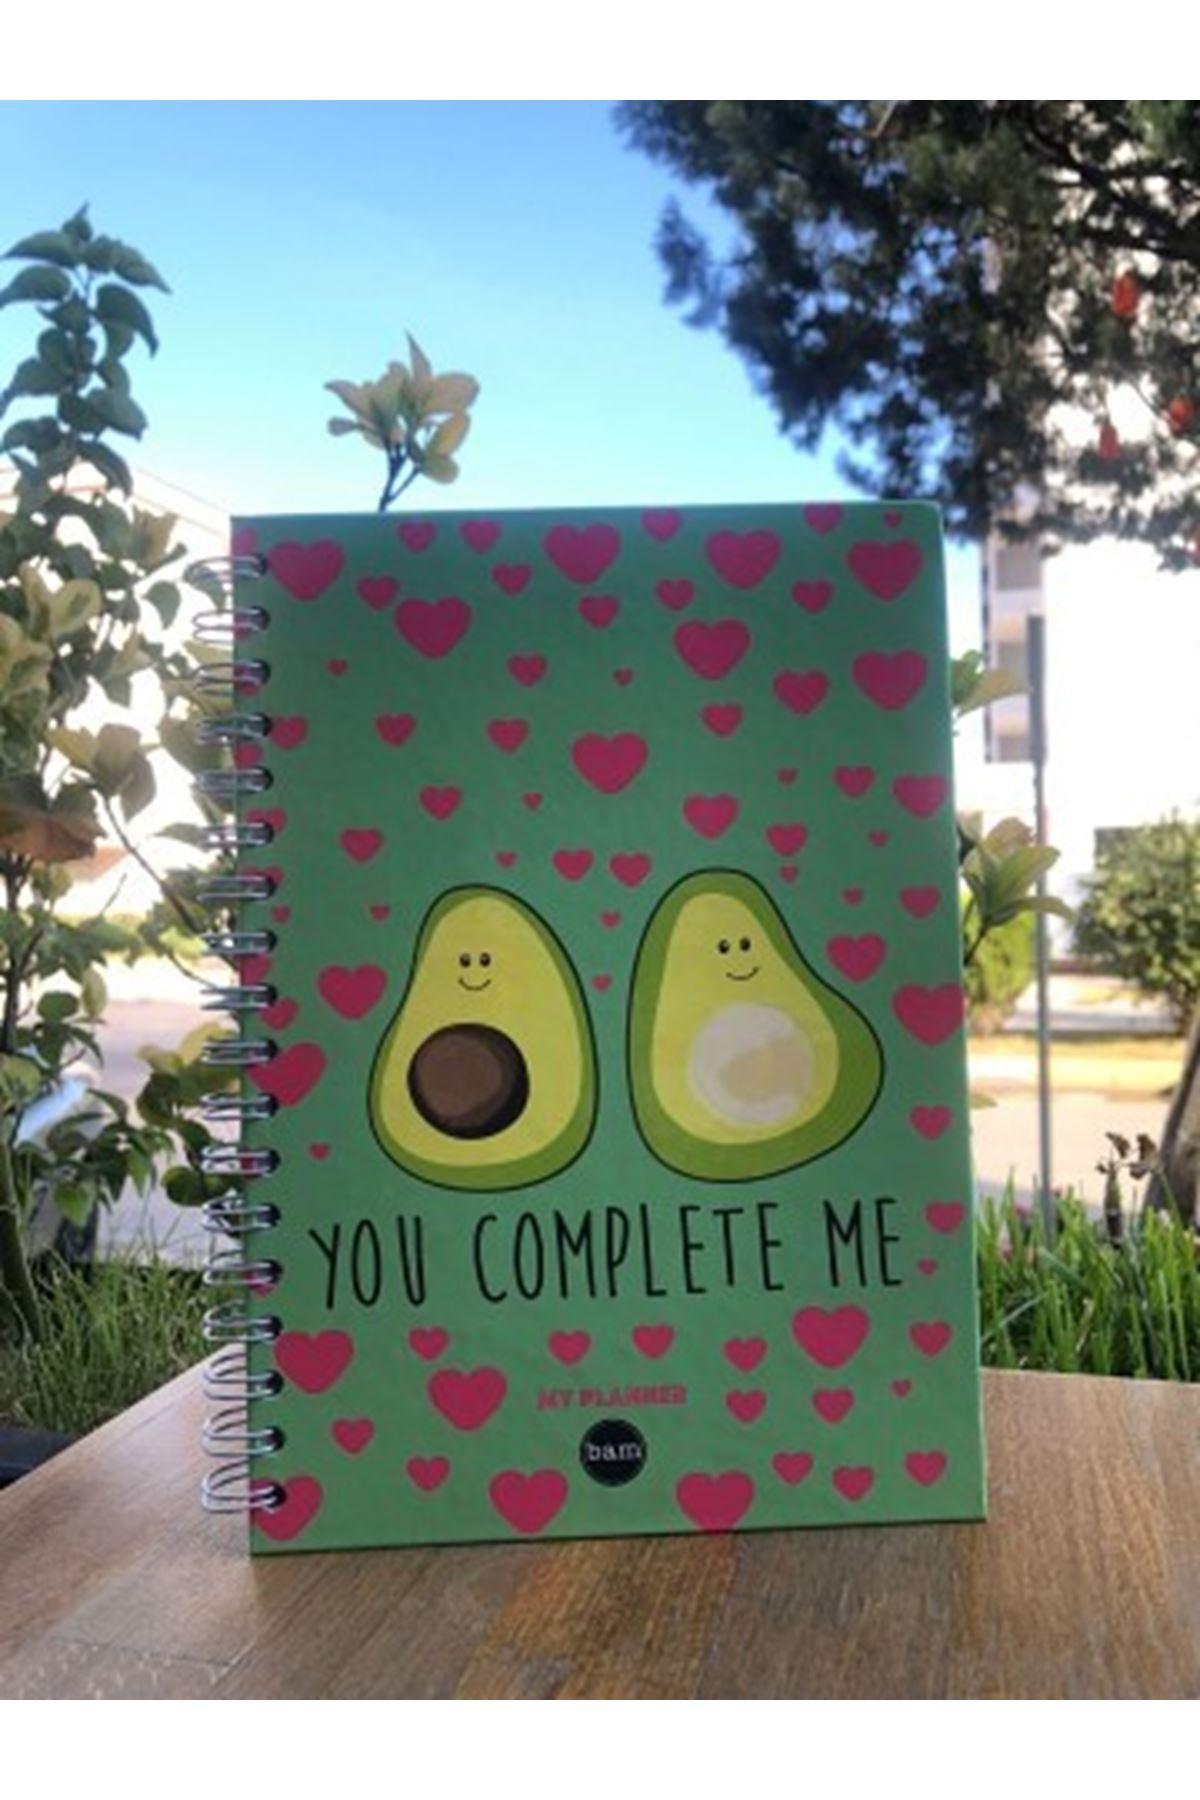 YOU COMPLETE ME - KONUŞAN AJANDA TELLİ